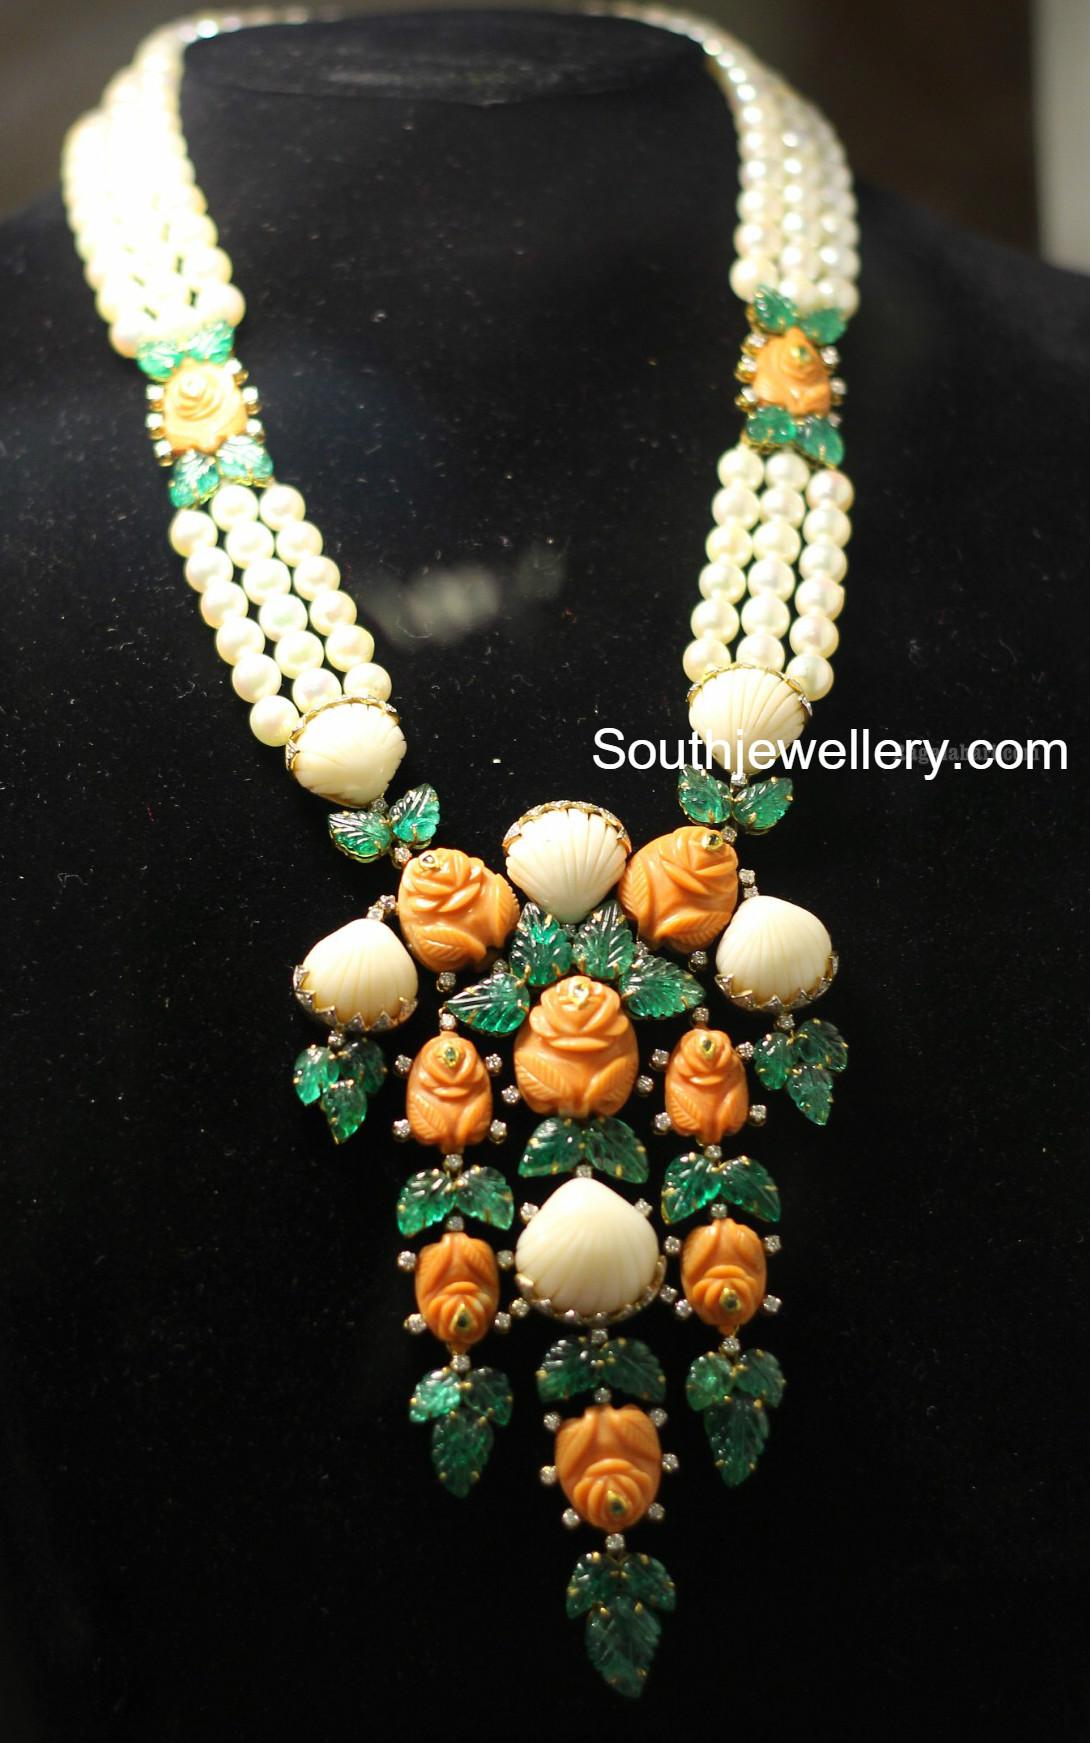 Malabar gold jewellery designs dubai - Pearls Mala With Coral Rose Pendant